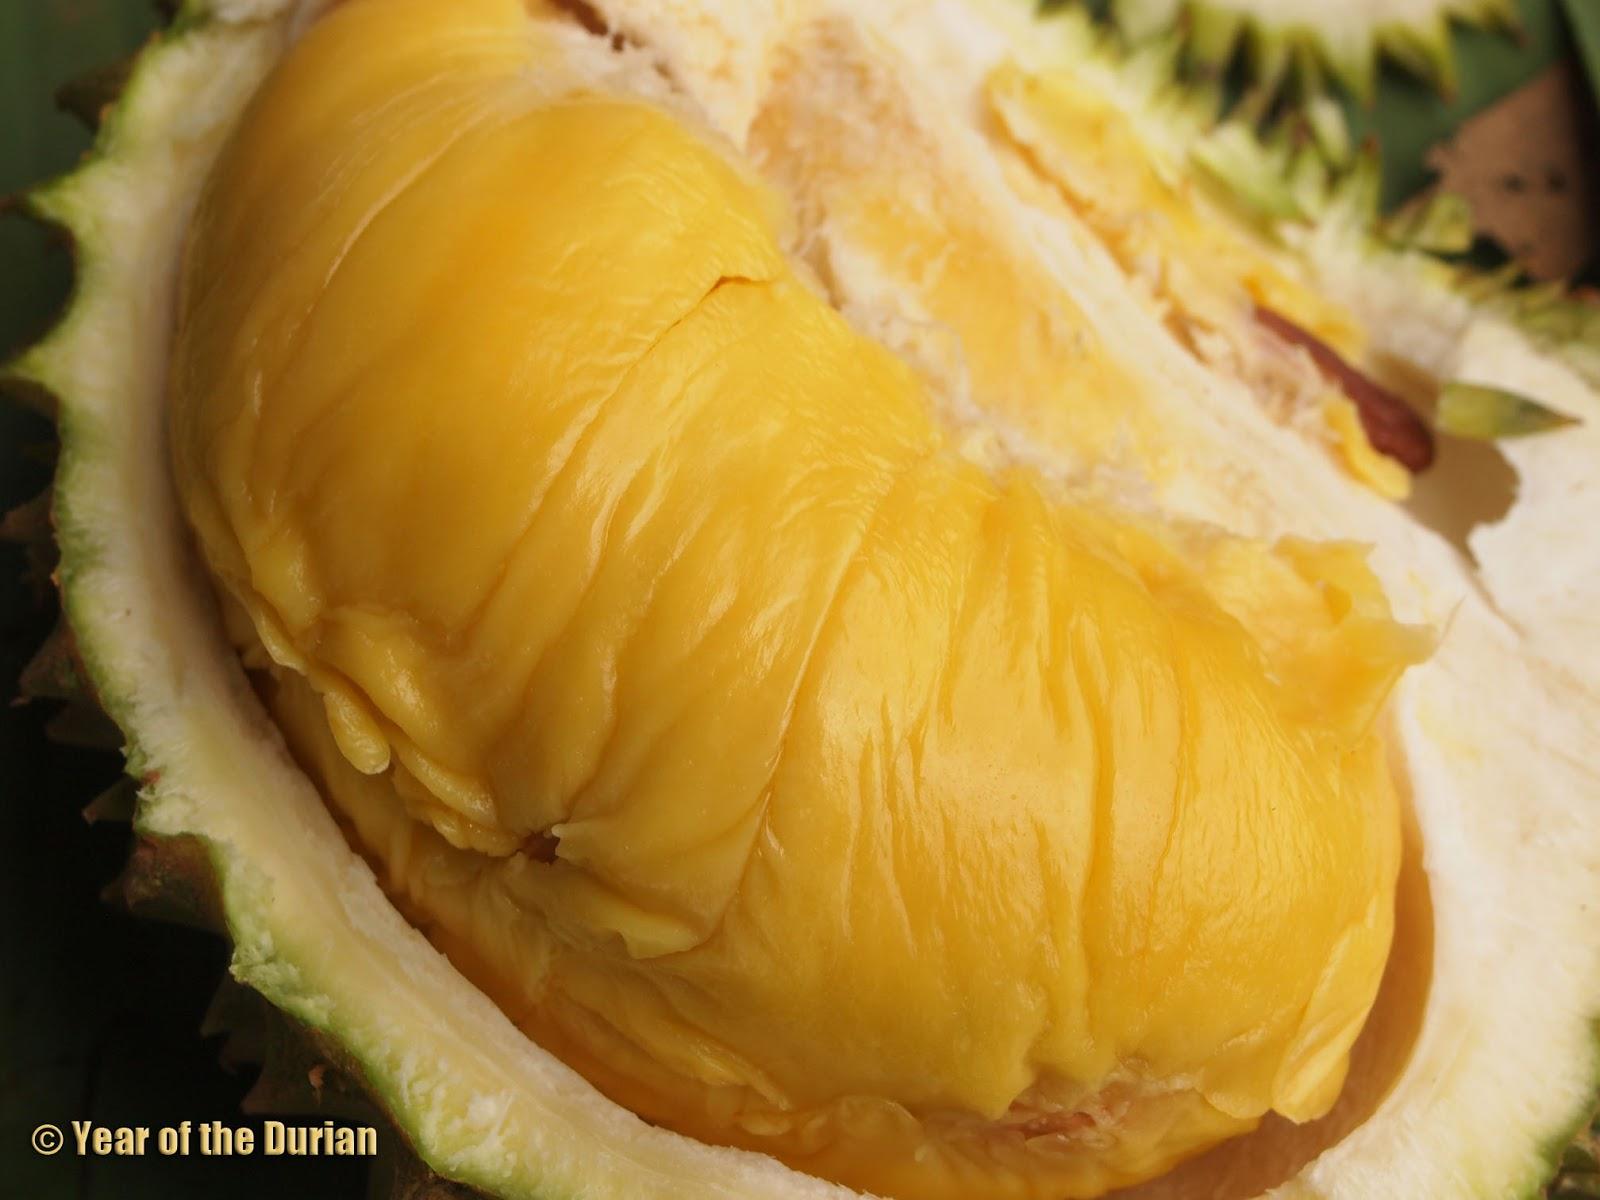 Durian_20150617-025116_1.jpg